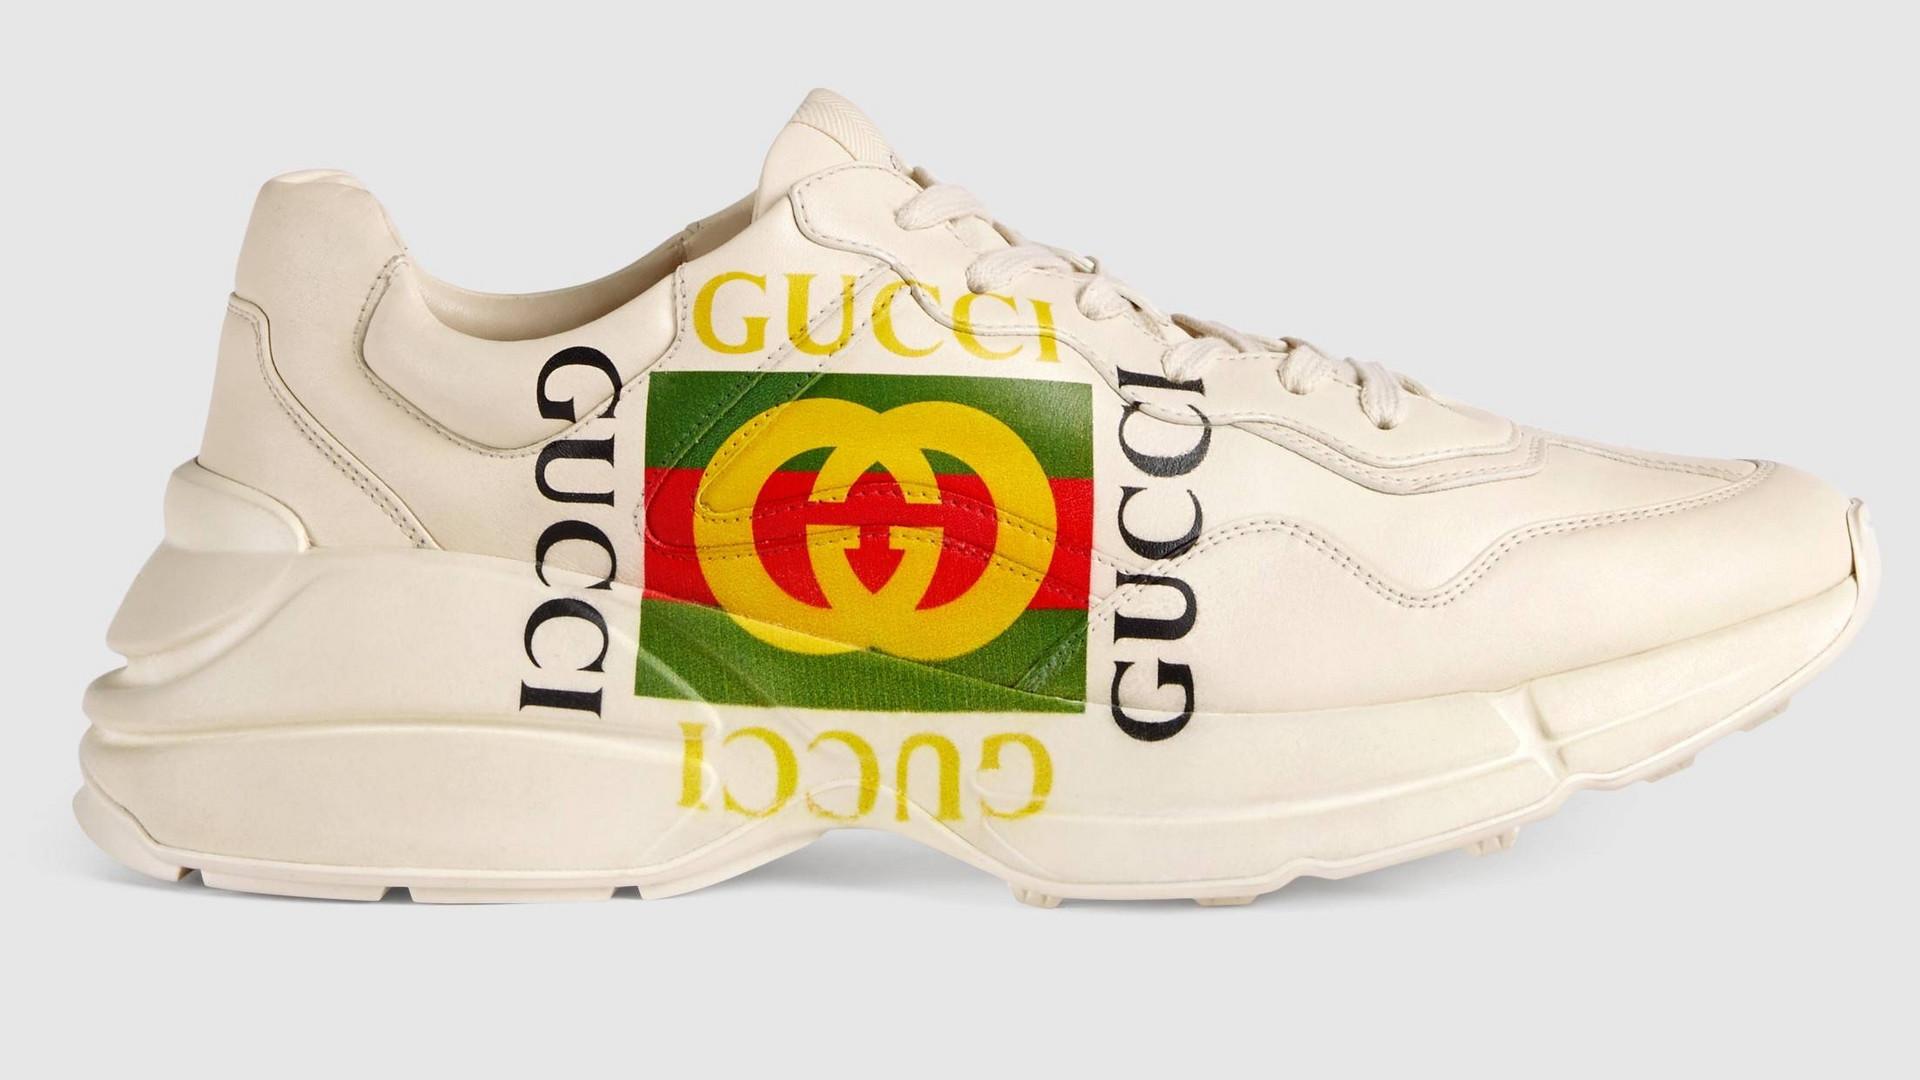 8dab594403fea6 Gucci bringt neuen Retro-Sneaker raus - Noizz